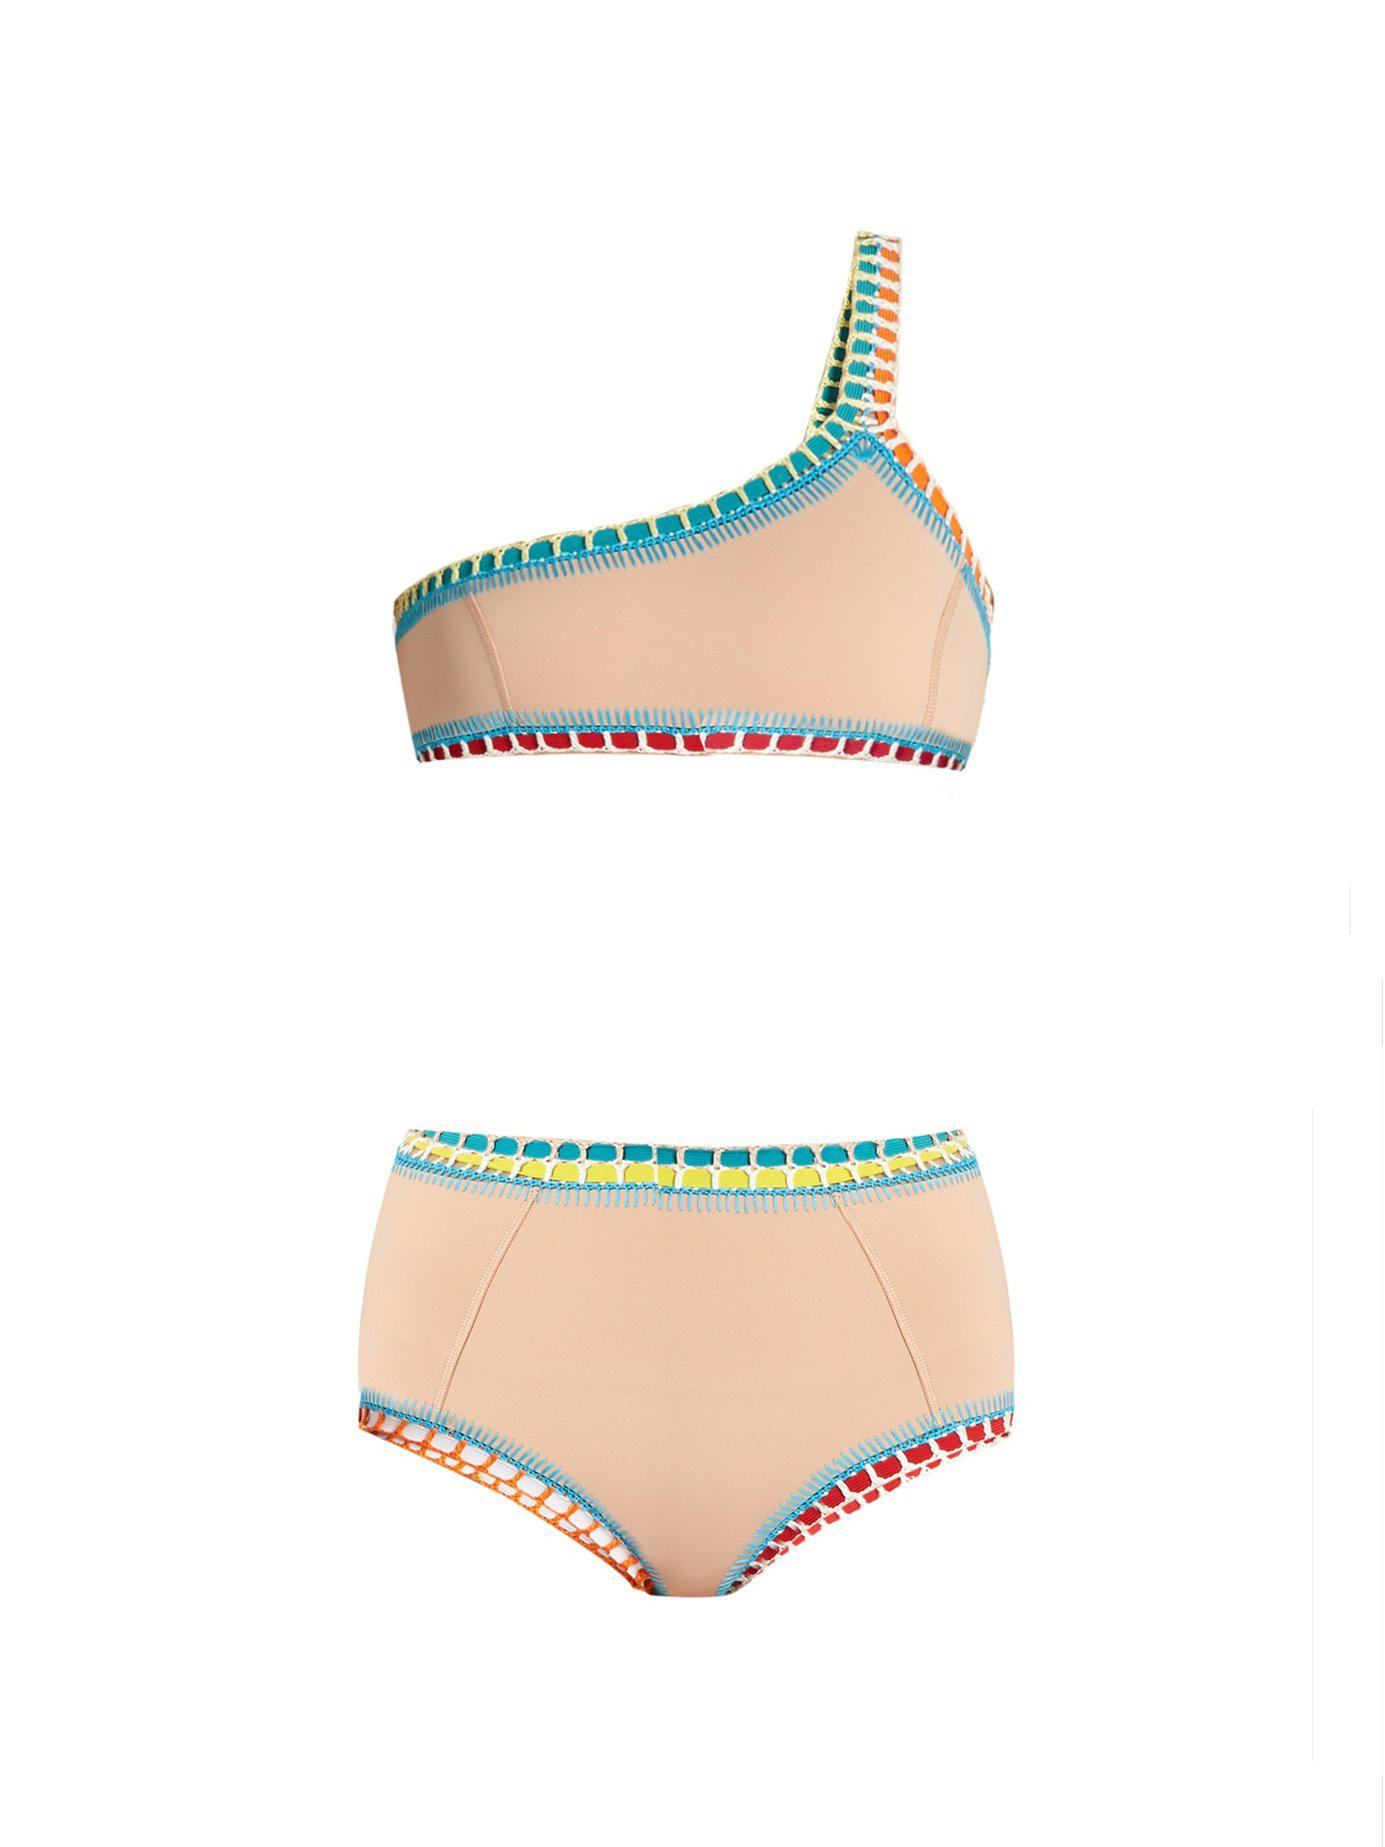 43b51ac8f9644 KIINI. Women s Luna Crochet Trim Triangle Bikini